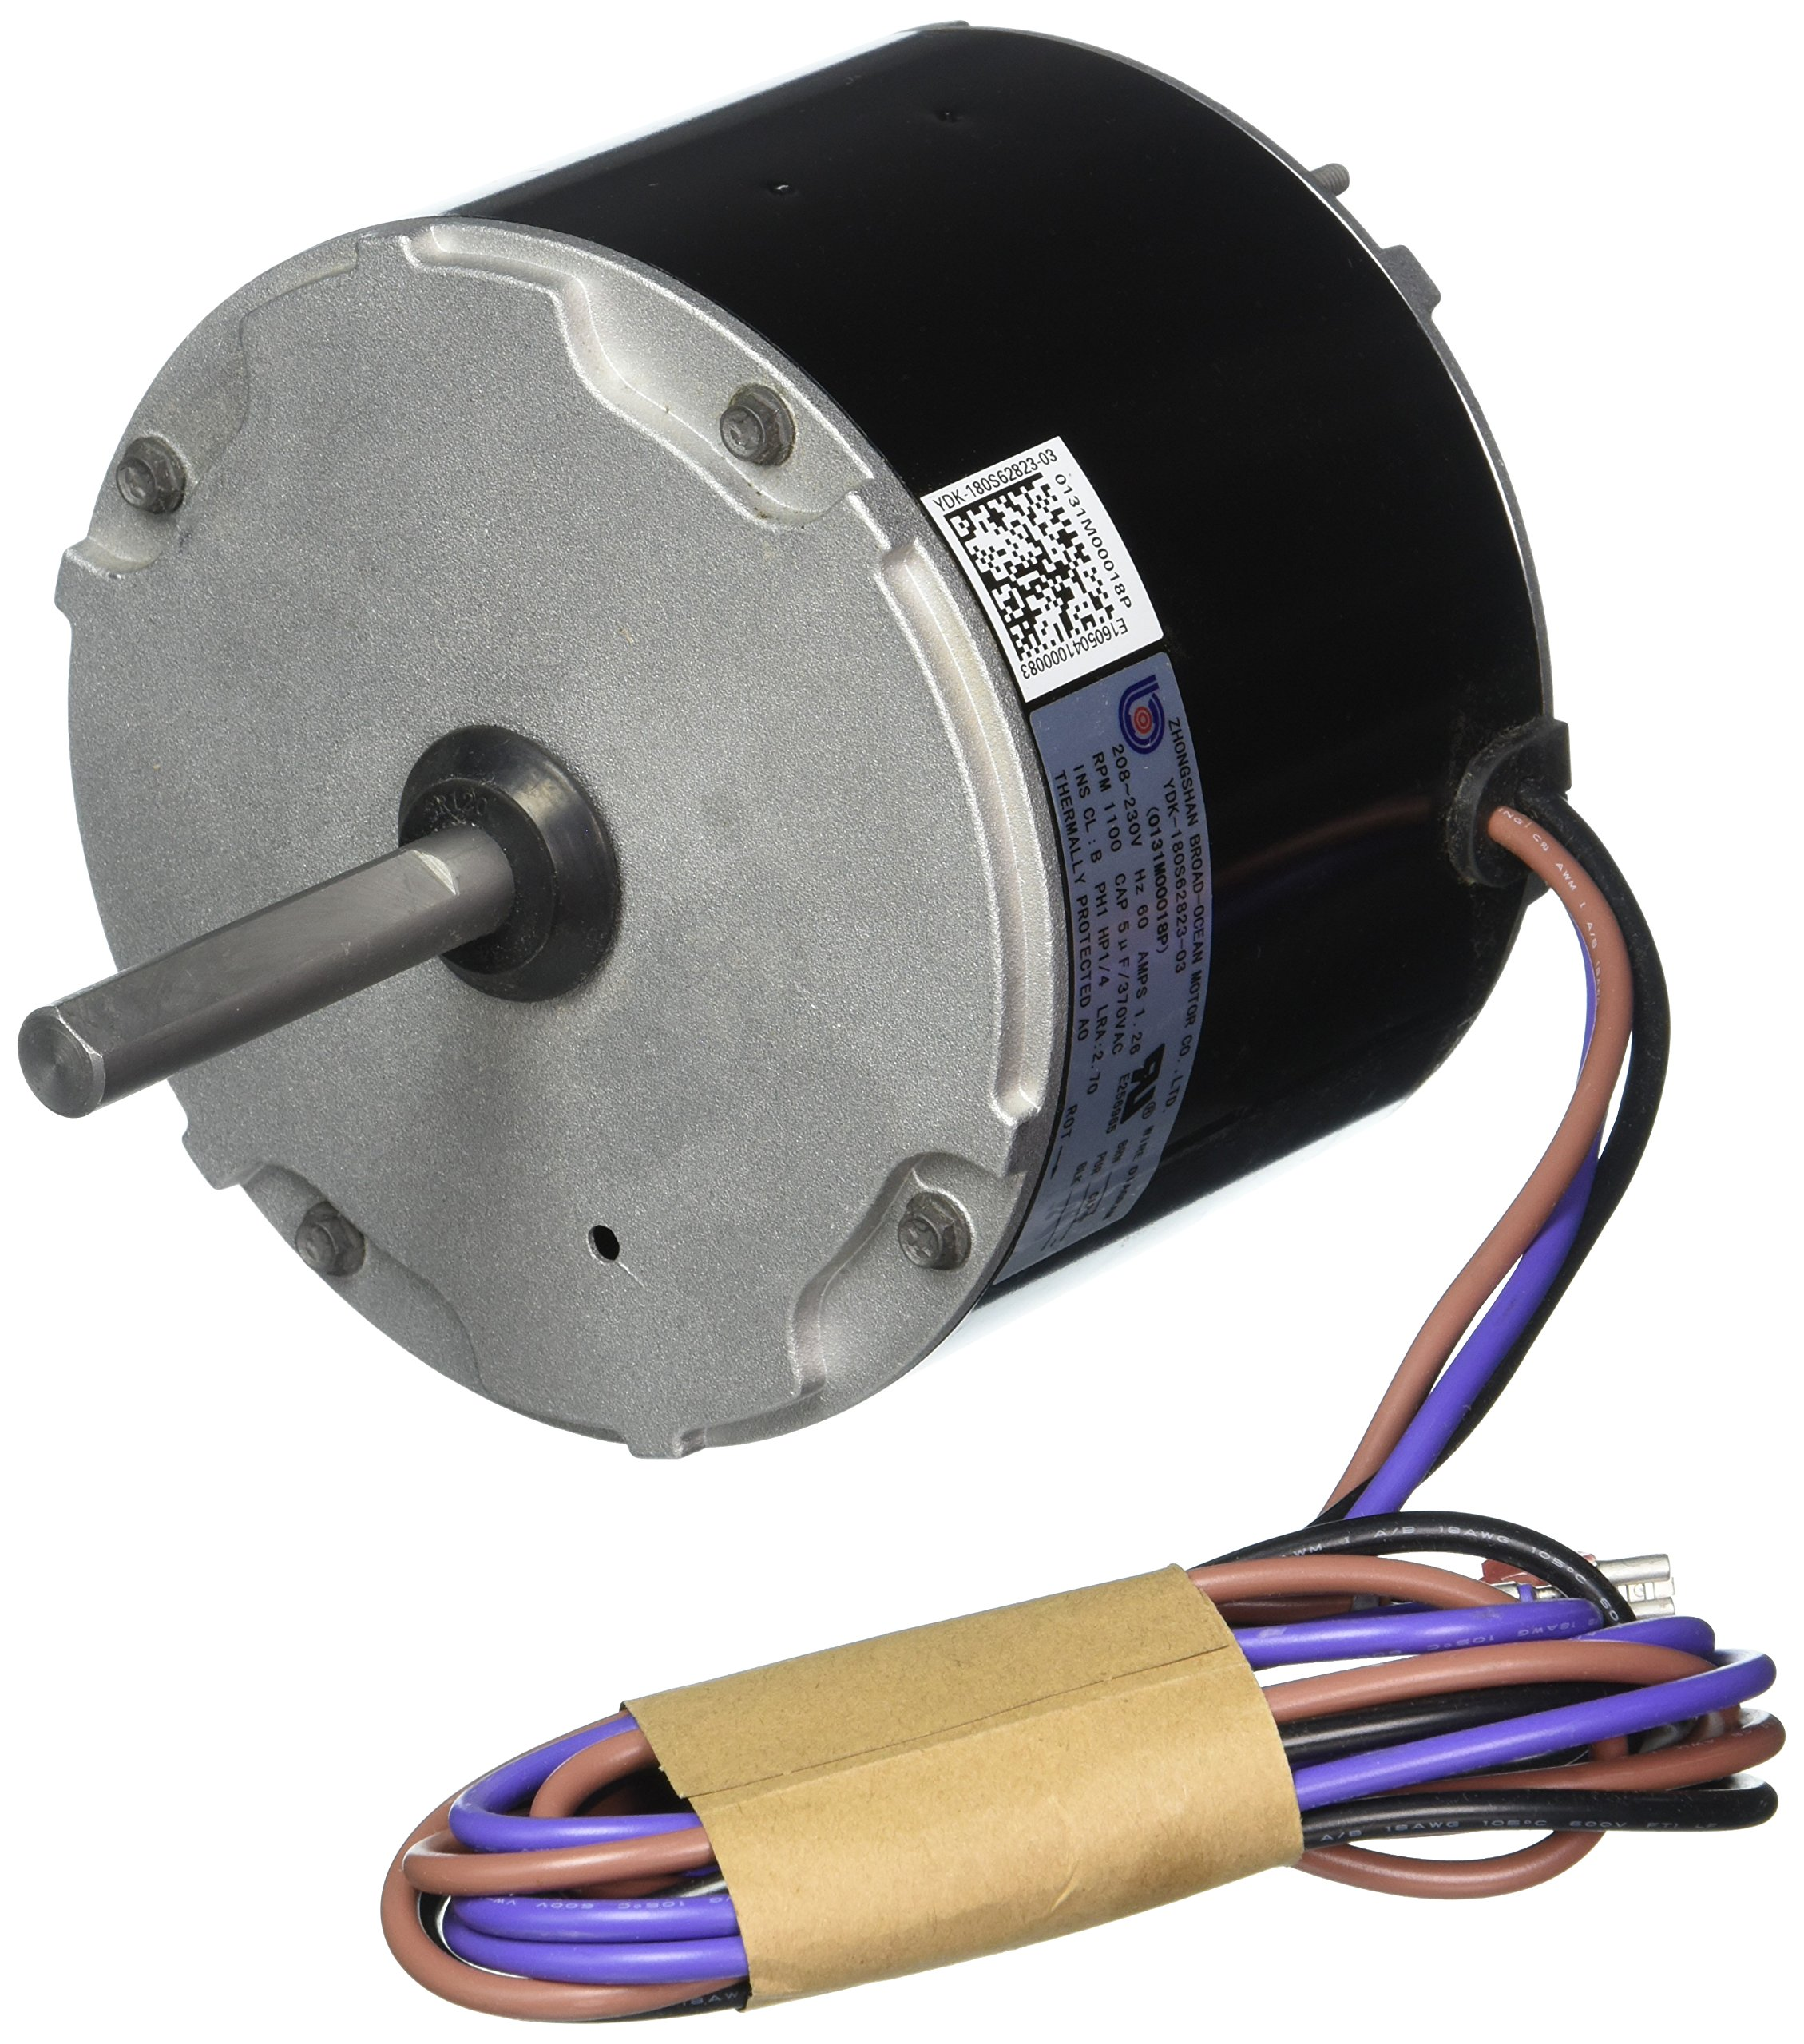 Goodman 0131M00018PSP 1-Speed Condenser Fan Motor, 208/230 Volts, 1/4 Hp, 1,100 RPM by Goodman (Image #1)